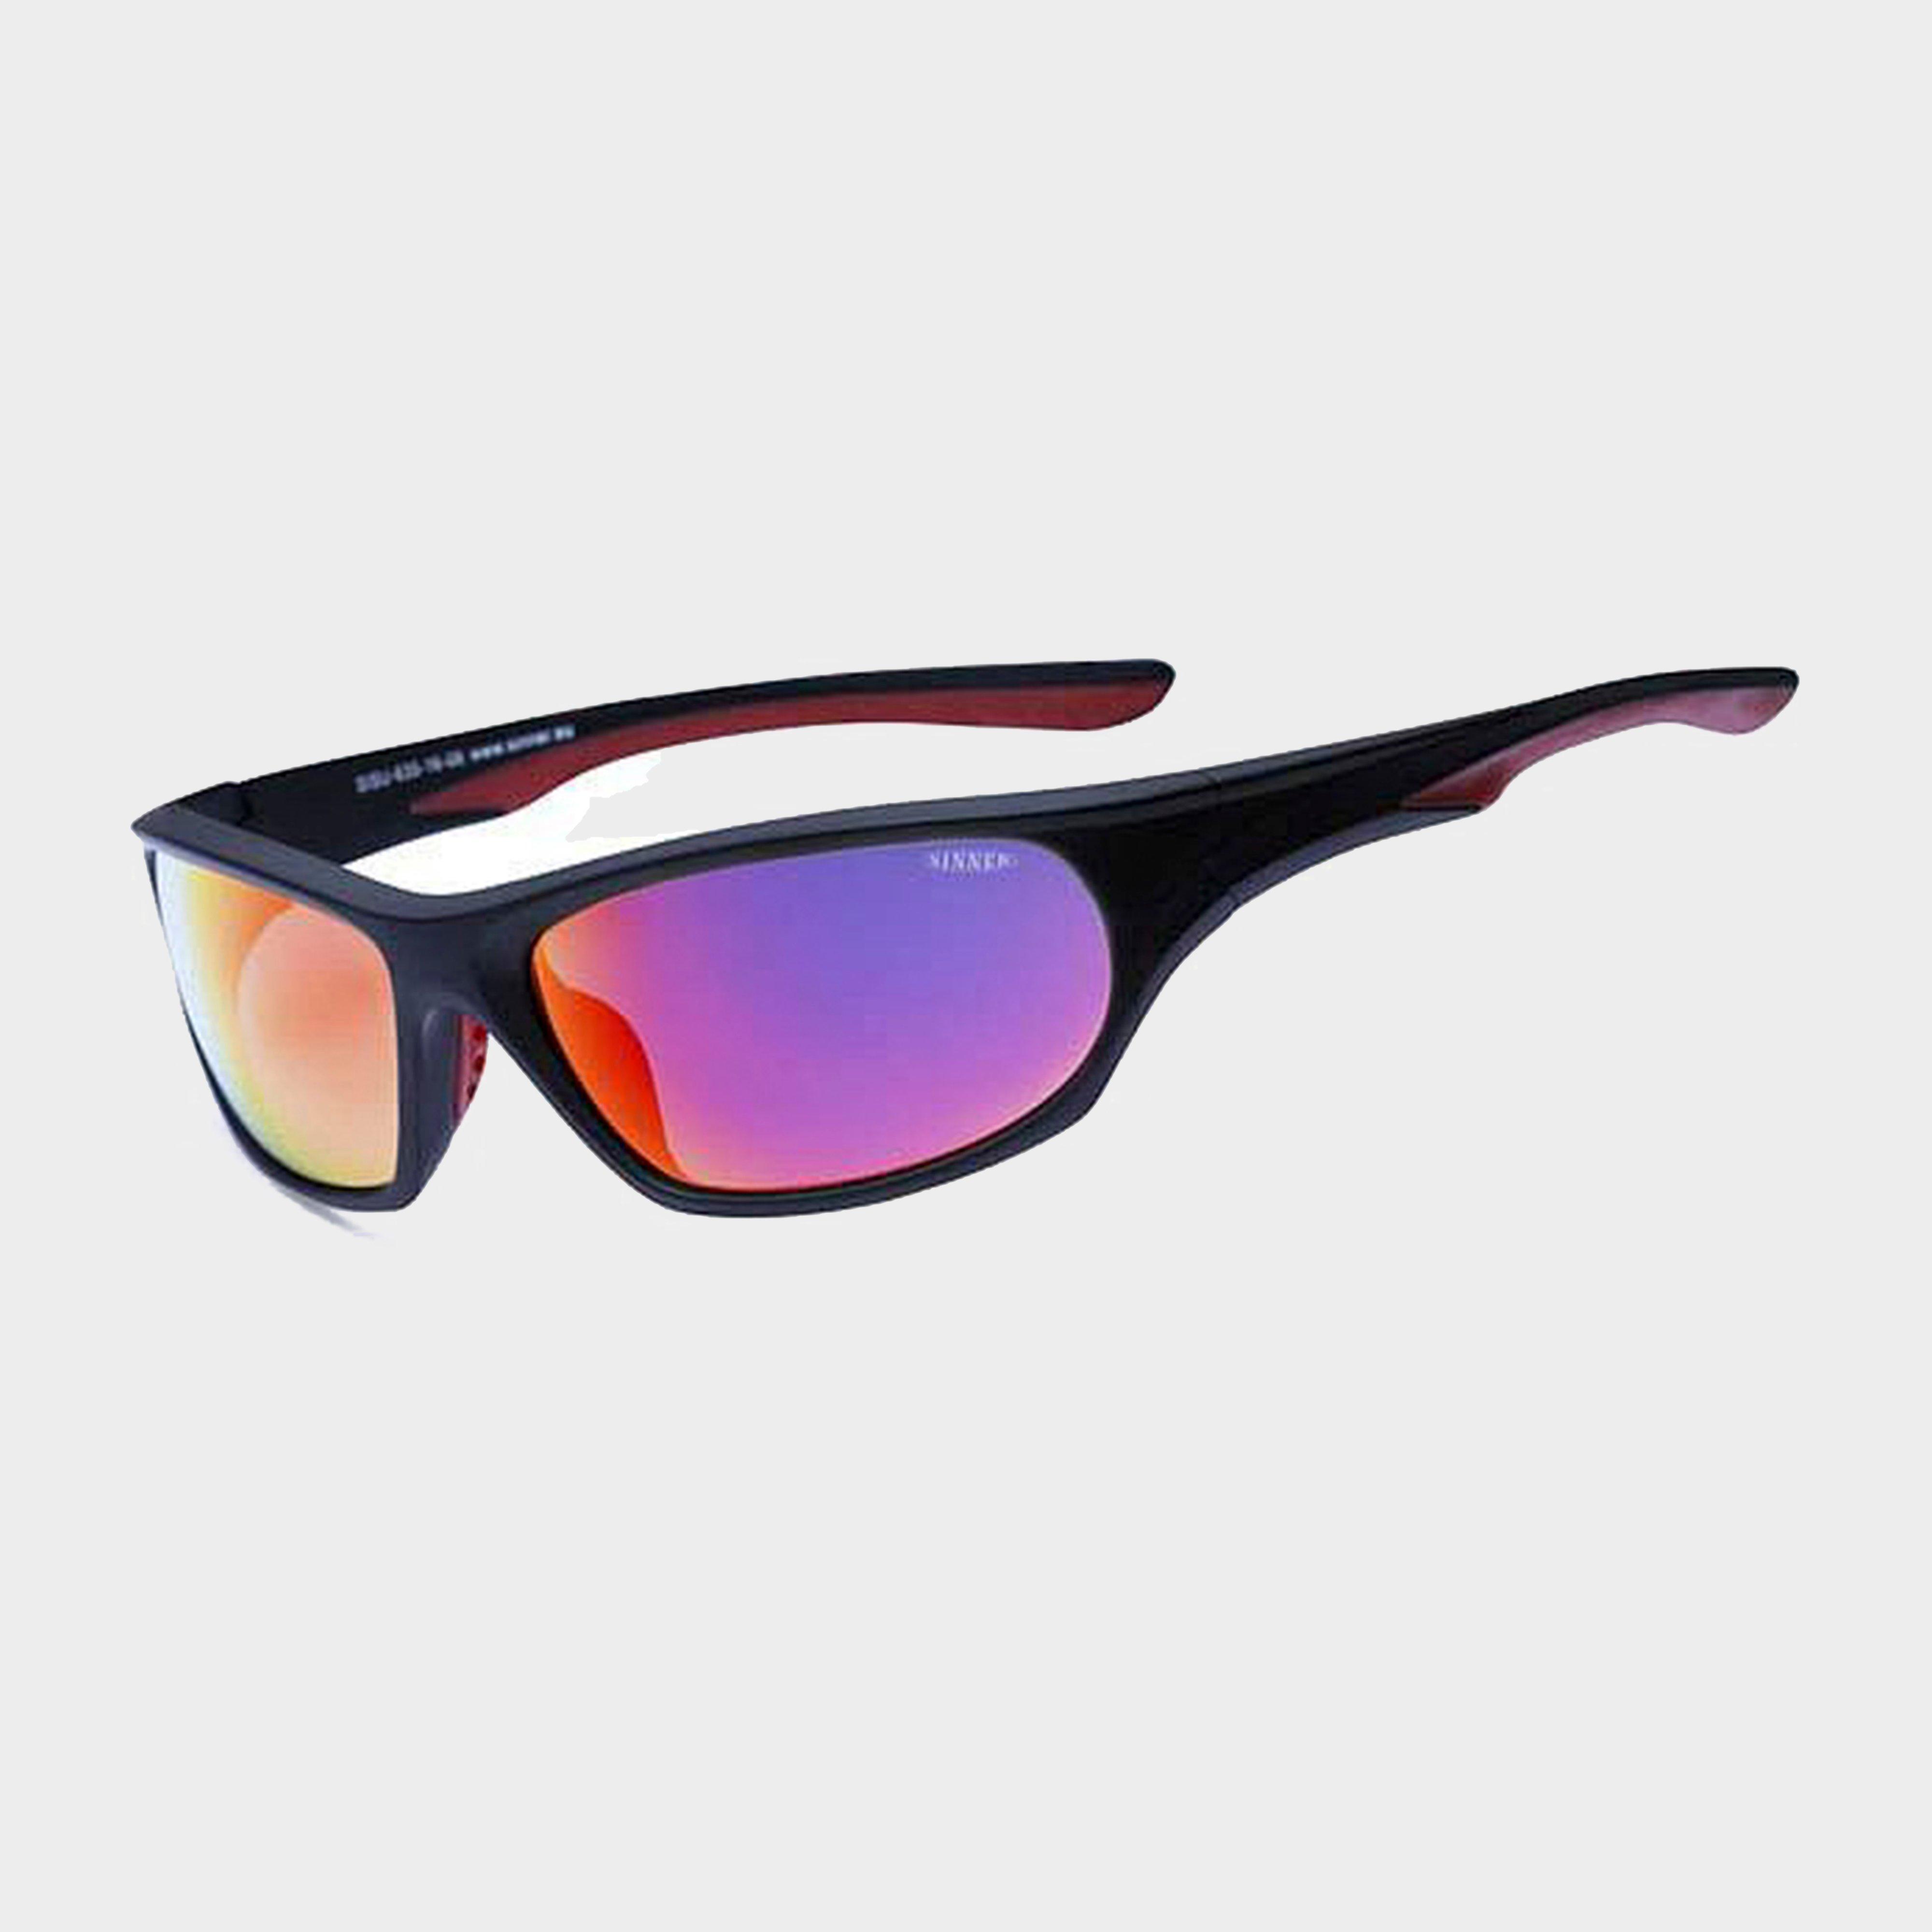 Image of Sinner Fury Sunglasses - Black/Blk, BLACK/BLK